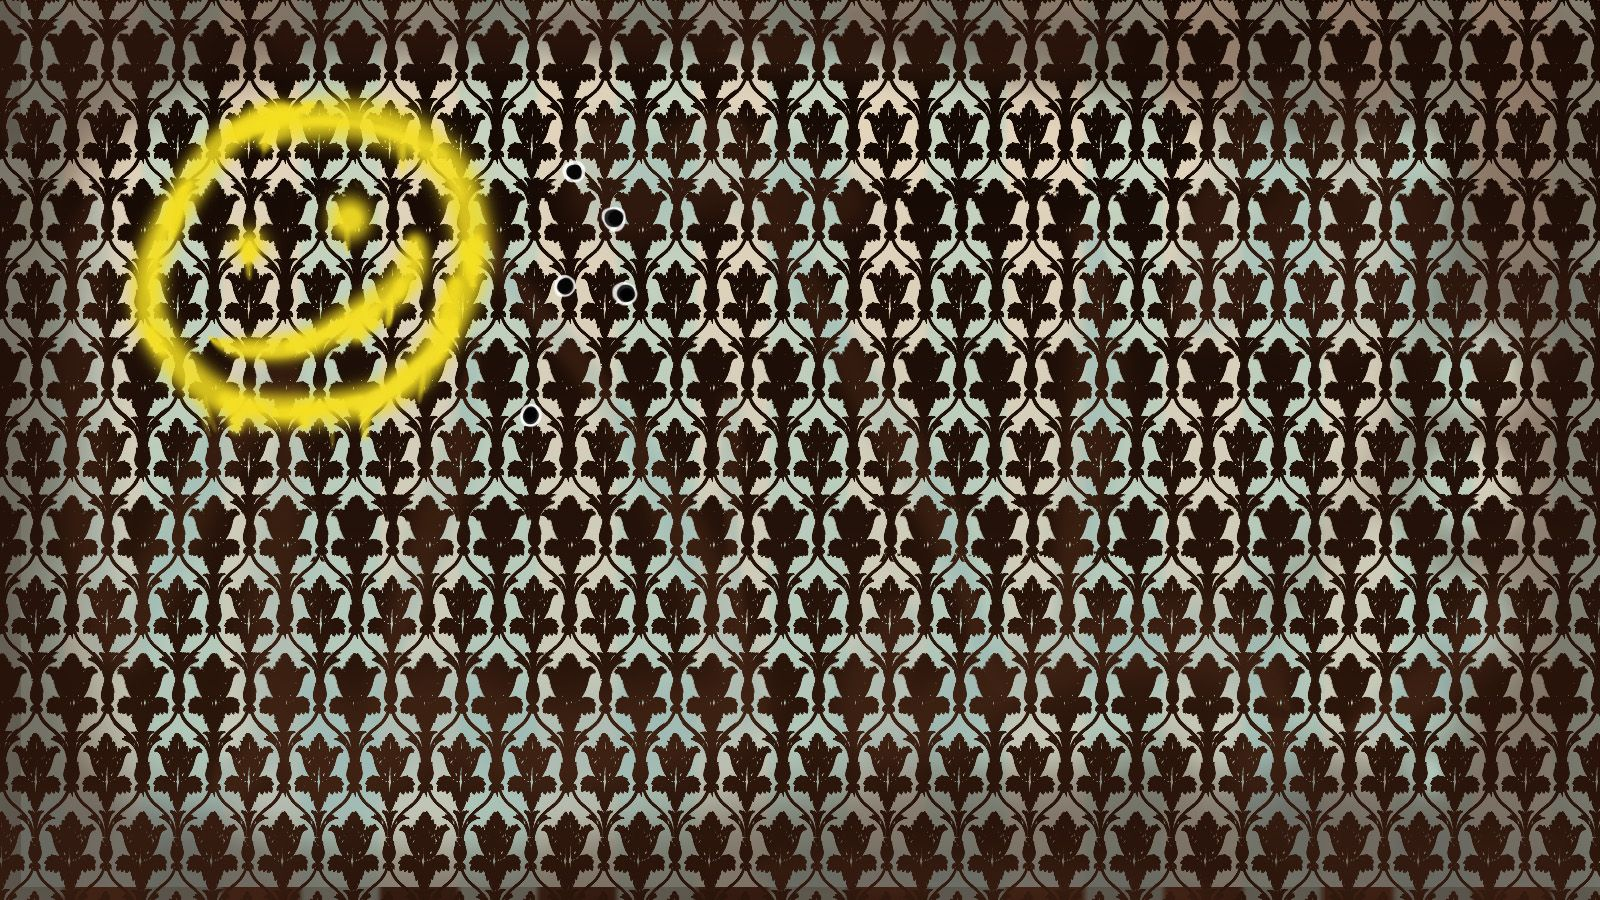 BBC Sherlock Wallpaper | Sherlock wallpaper - Sherlock on BBC One Wallpaper (33019561) - Fanpop .